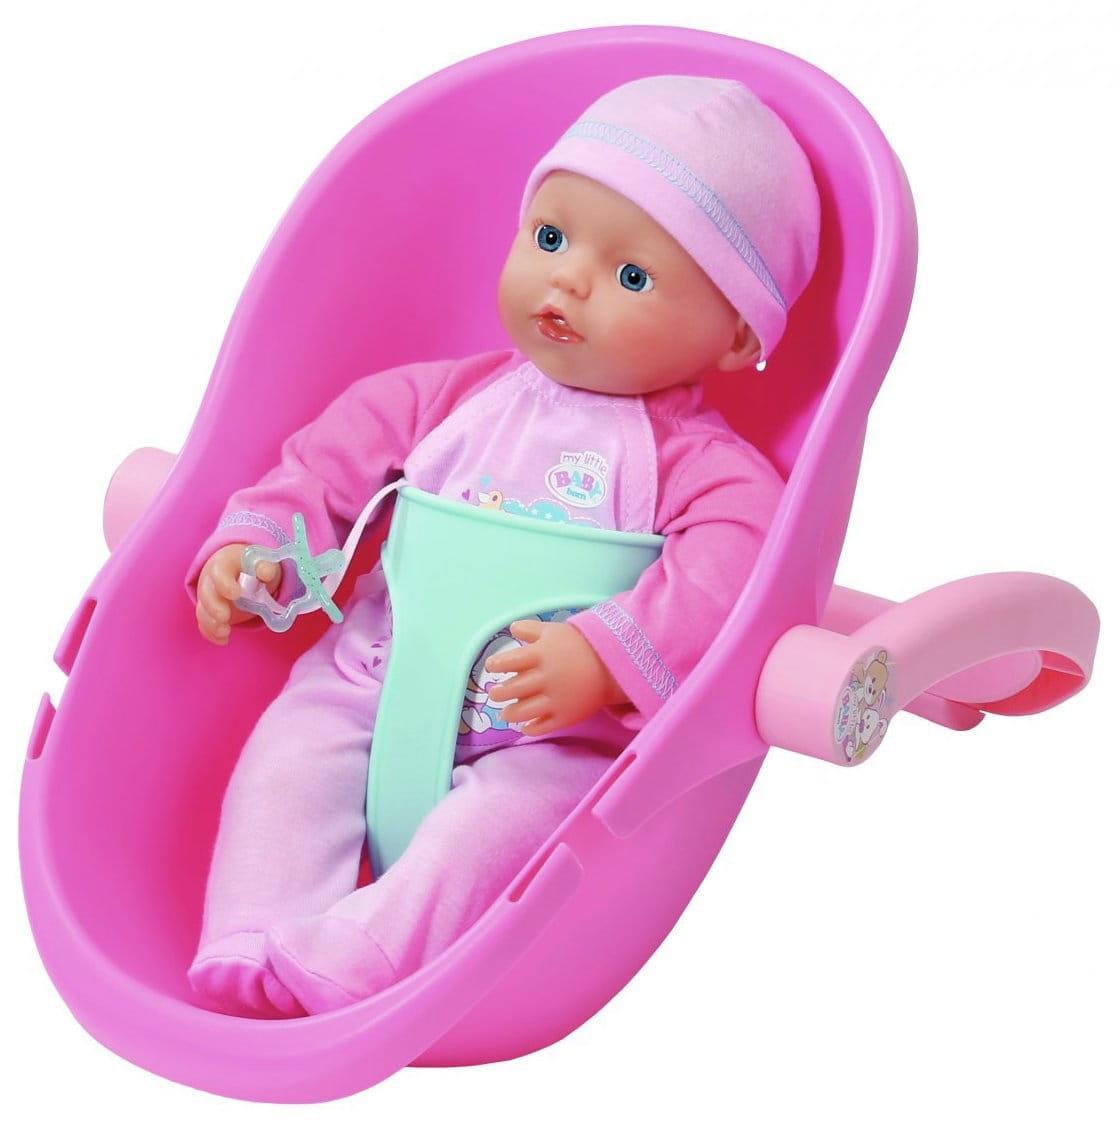 Кресло-переноска Baby Born 822-494 для куклы 32 см (Zapf Creation)